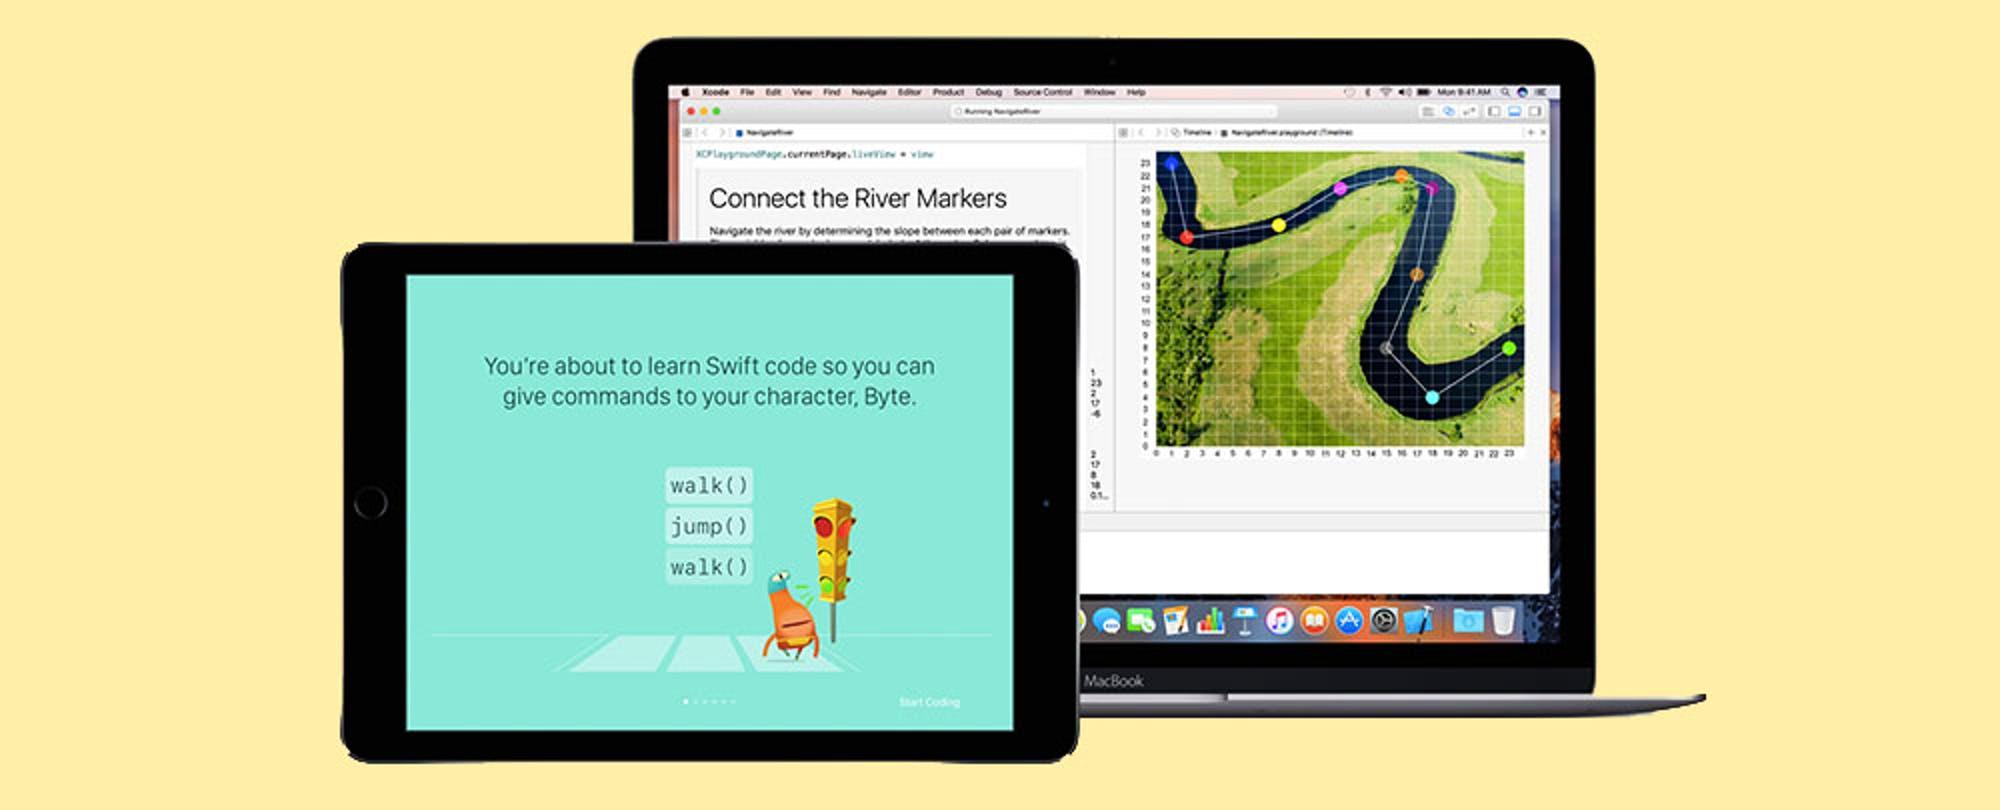 Apple Announces 'Everyone Can Code' Initiative and New Apple Teacher Program